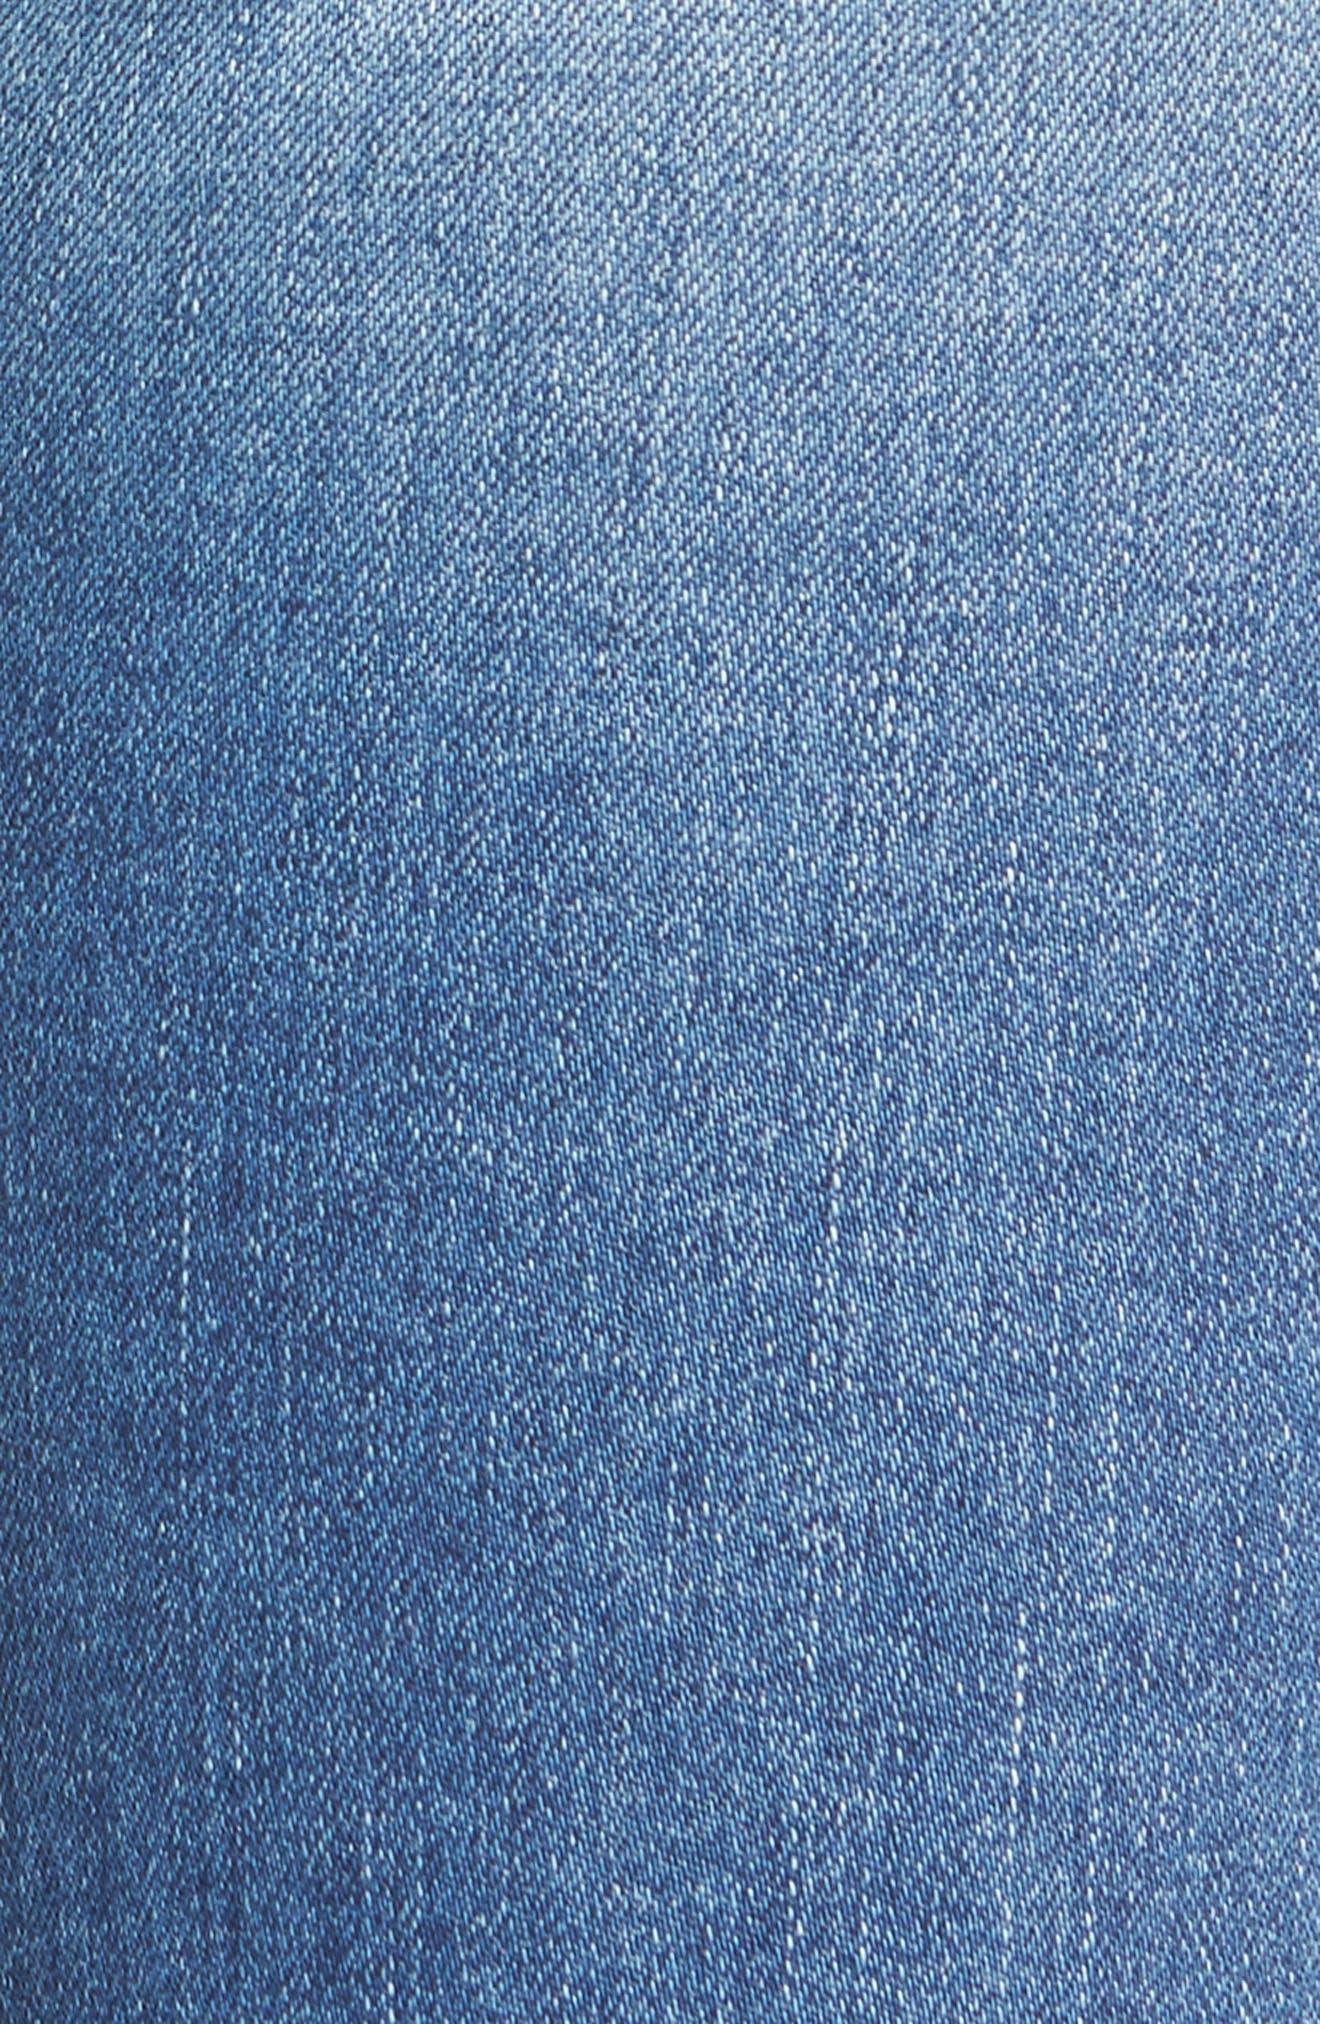 Tilda Crop Straight Leg Jeans,                             Alternate thumbnail 5, color,                             425